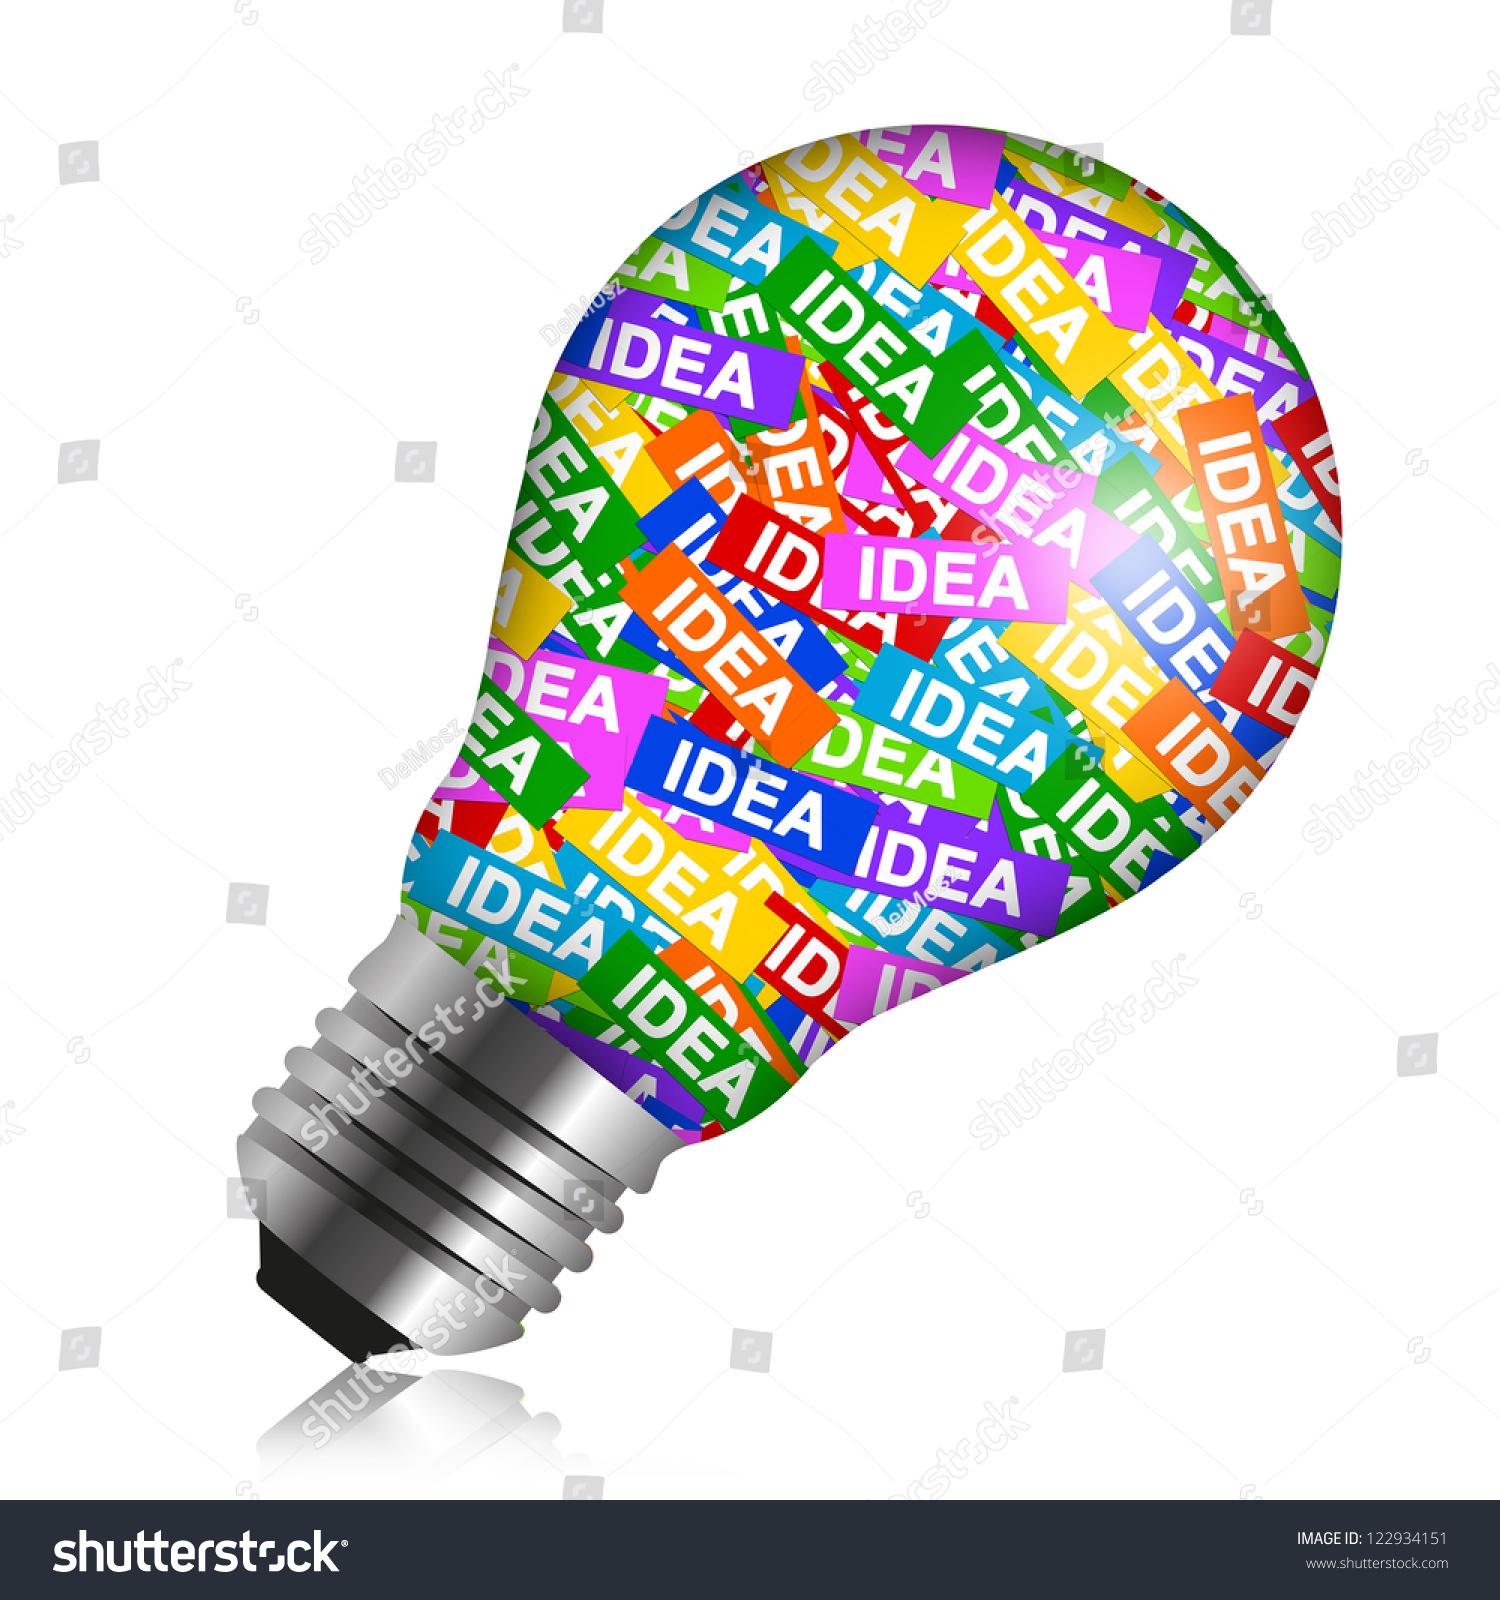 Business Idea Concept Present By Colorful Idea Label In